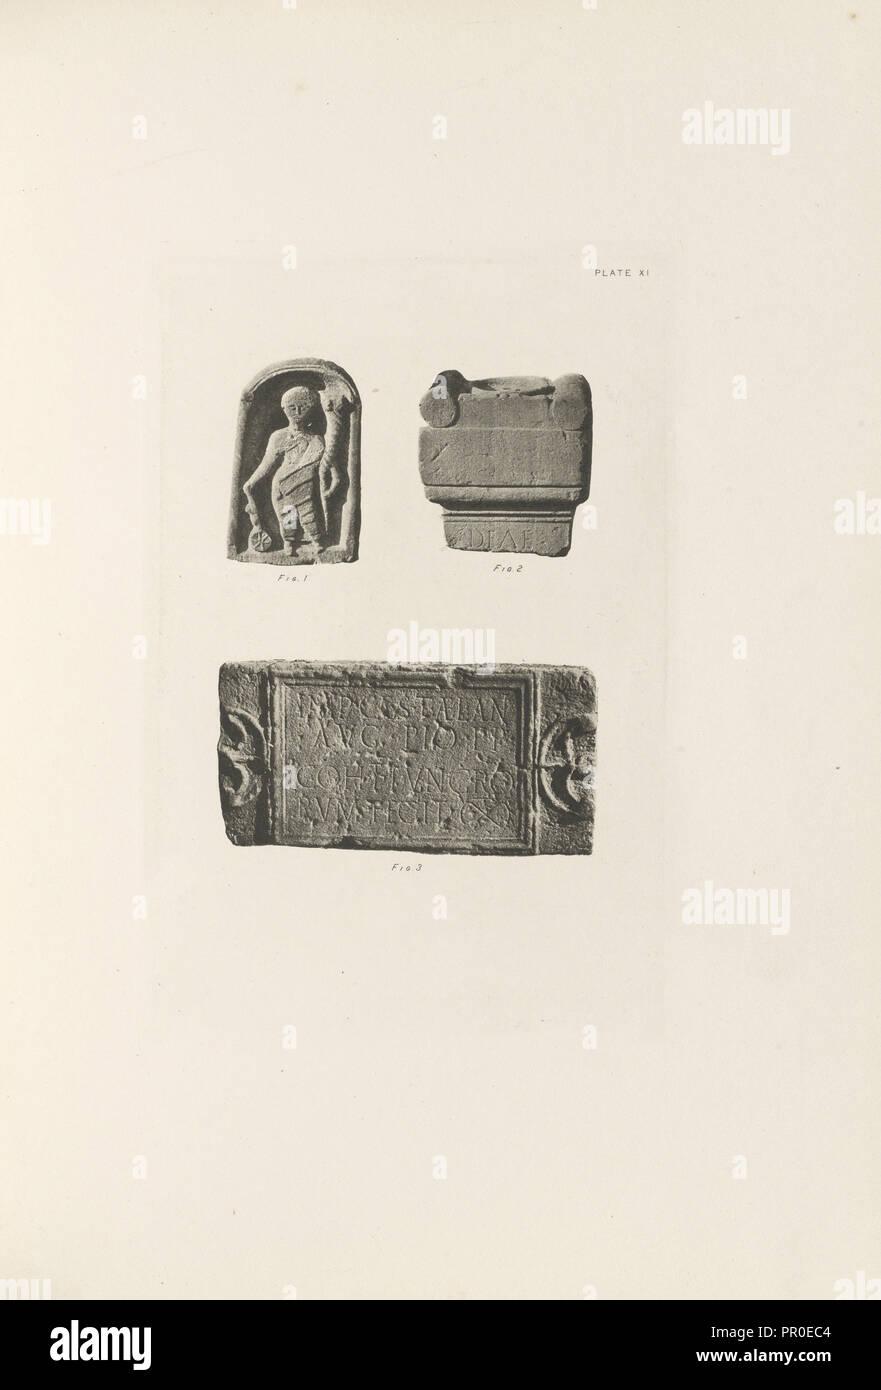 Plate XI; Thomas Annan, Scottish,1829 - 1887, Glasgow, Scotland; 1897; Photogravure; Plate: 15.1 × 10 cm, 5 15,16 × 3 15,16 in - Stock Image